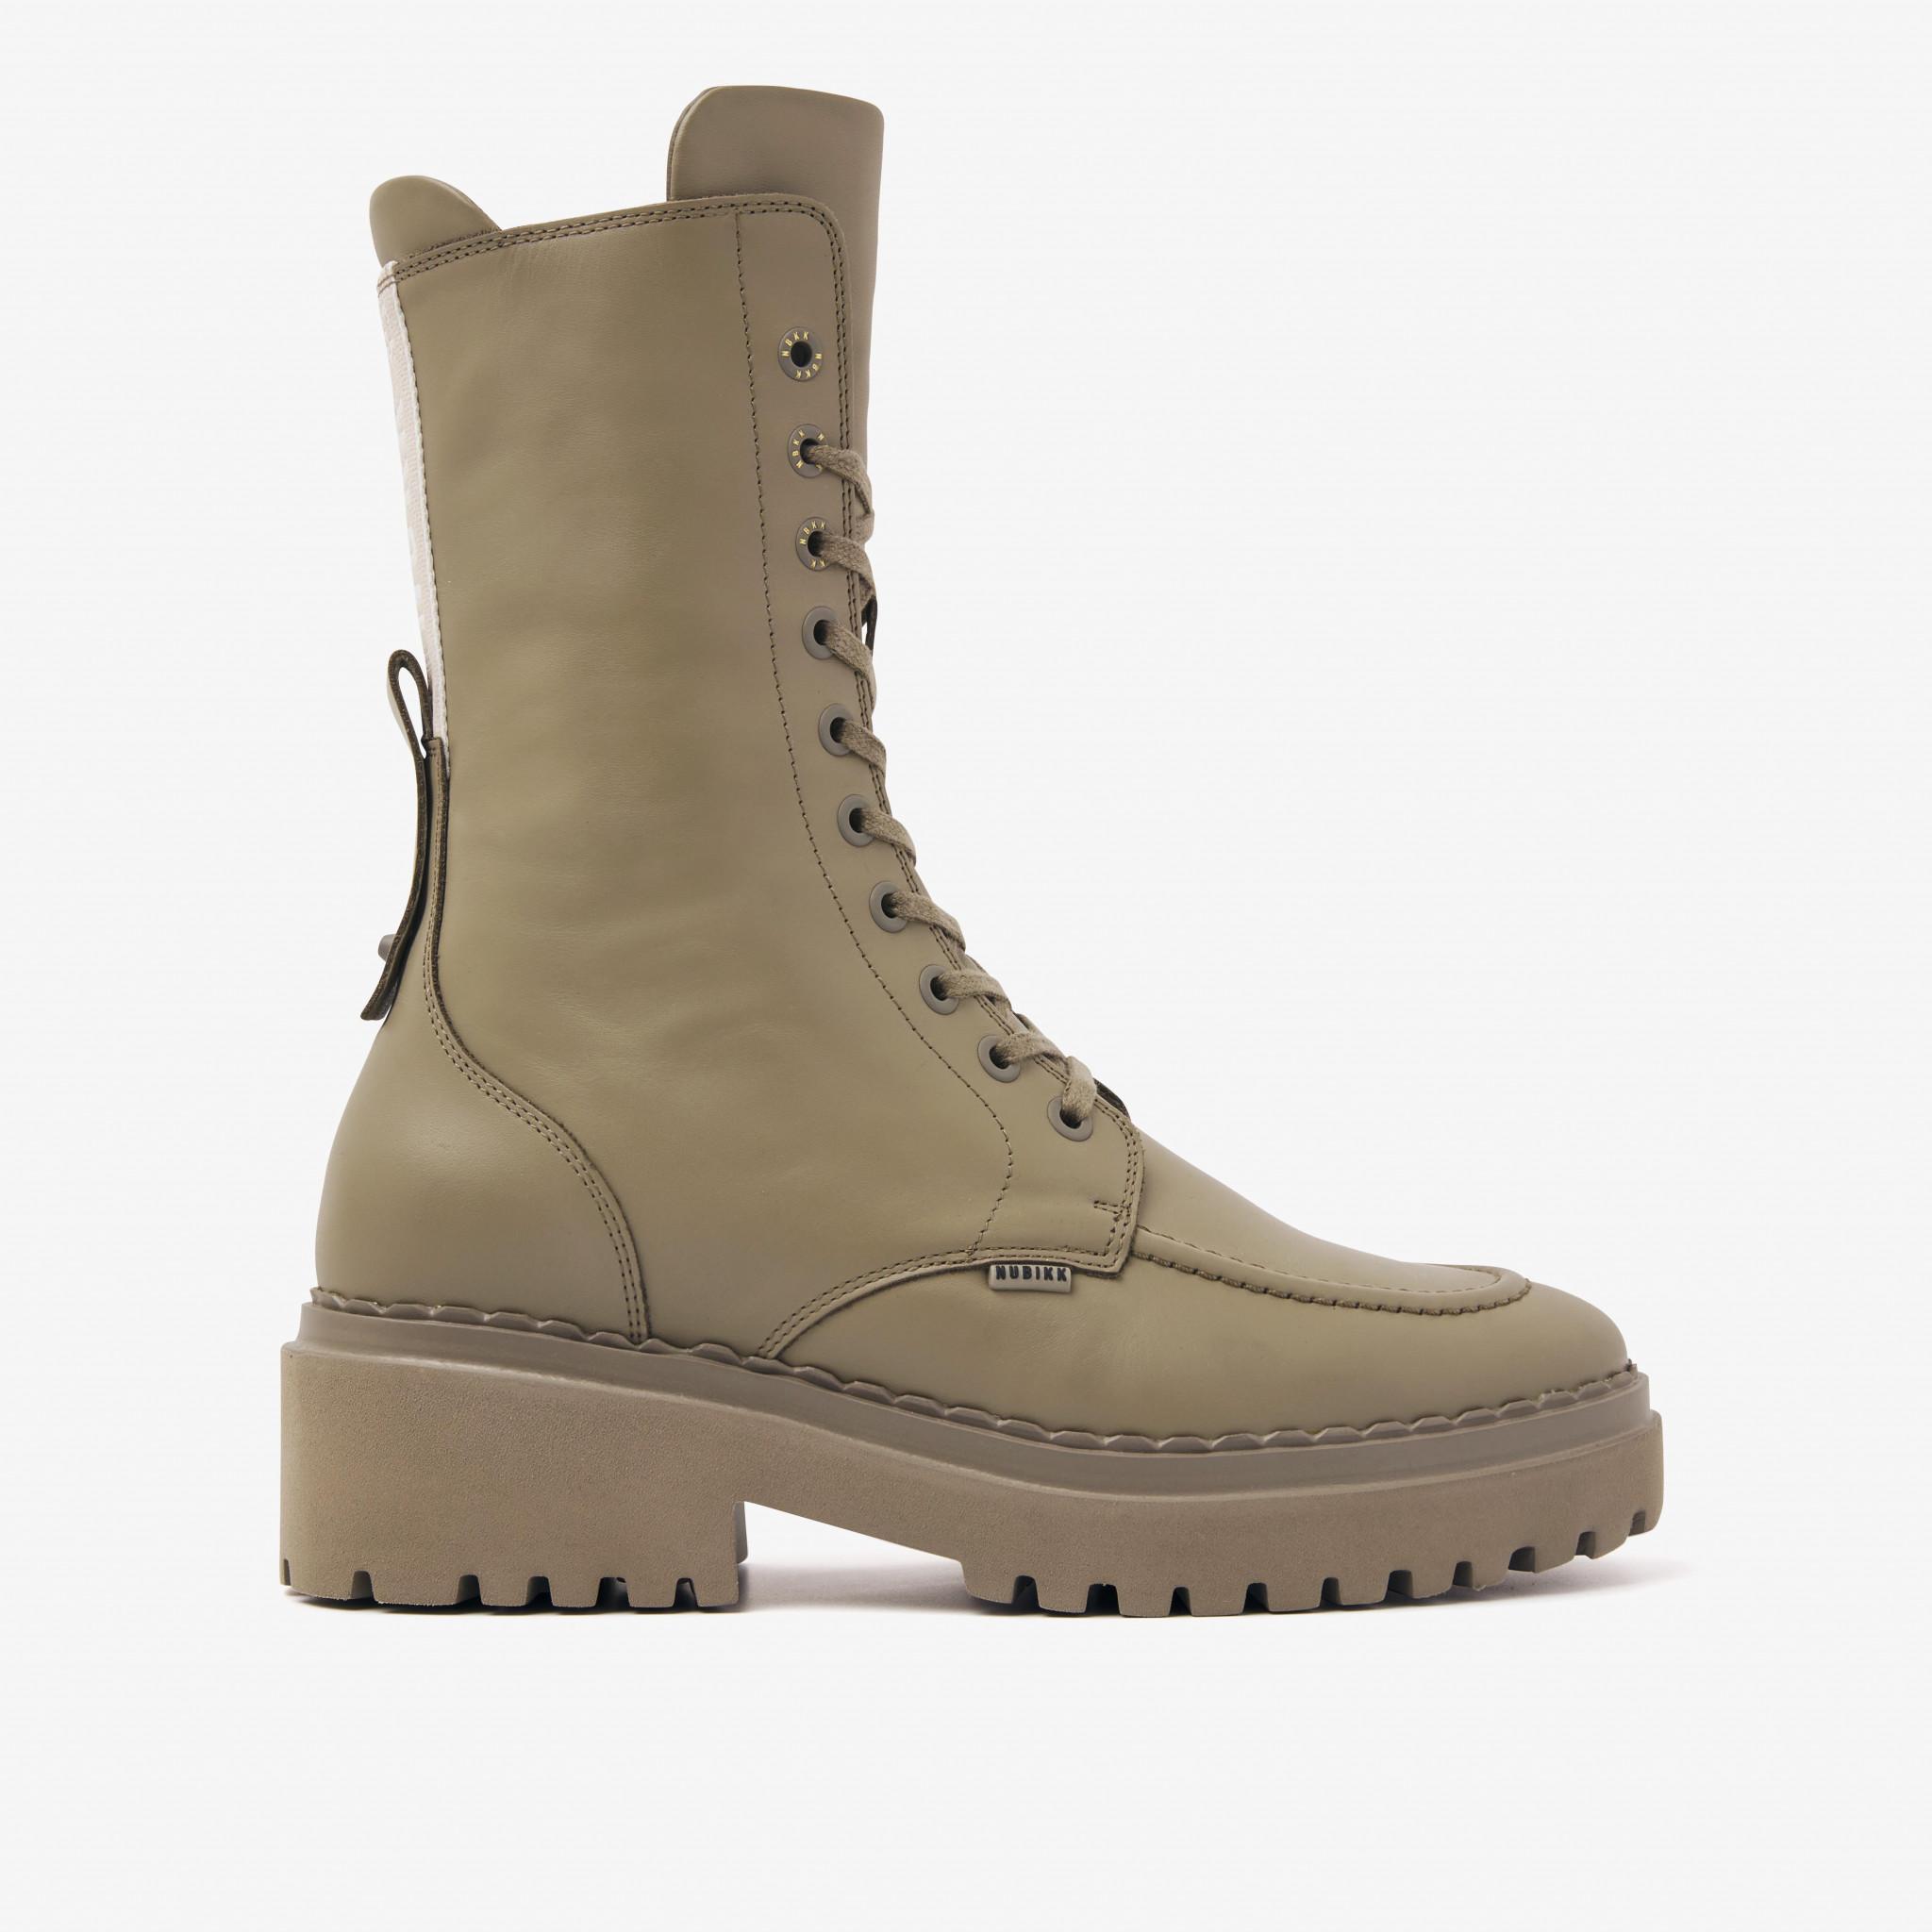 fae-aubine,Combat Boots, Nubikk, Boots